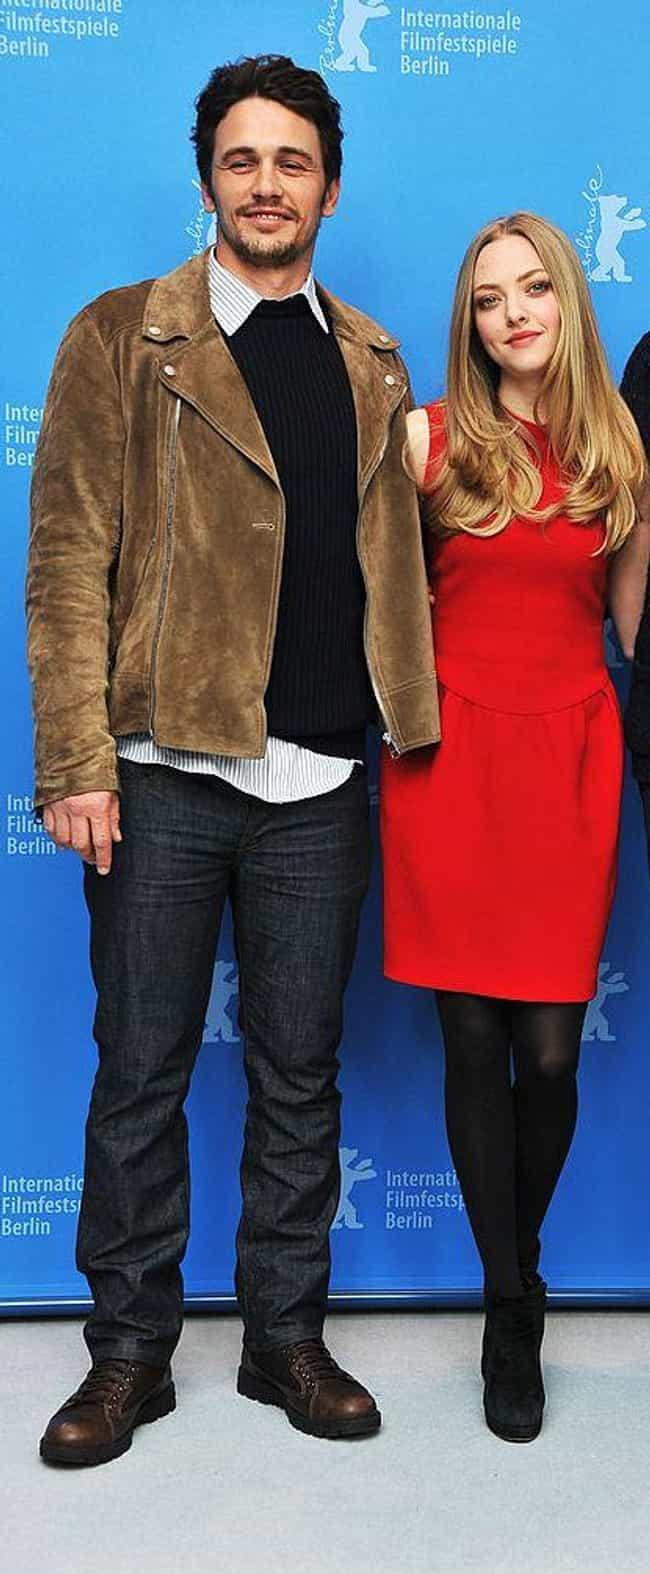 James Franco Girlfriend History Delightful who has james franco dated? | list of james franco dating history